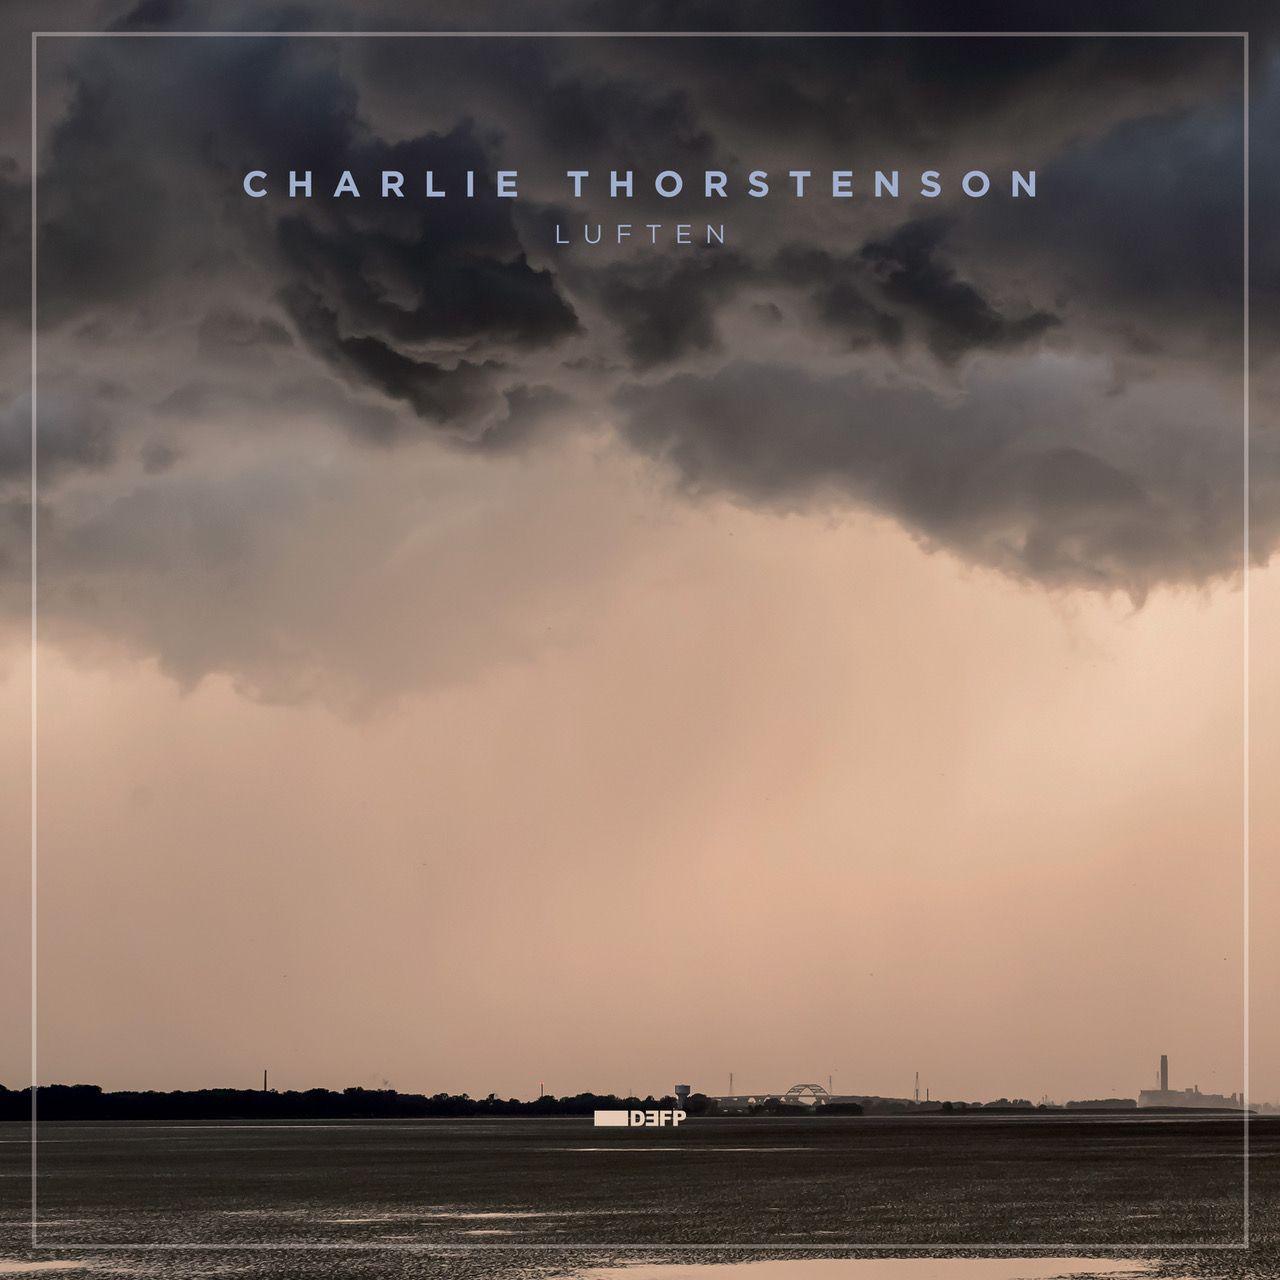 charlie-thorstenson-luften-art.jpeg